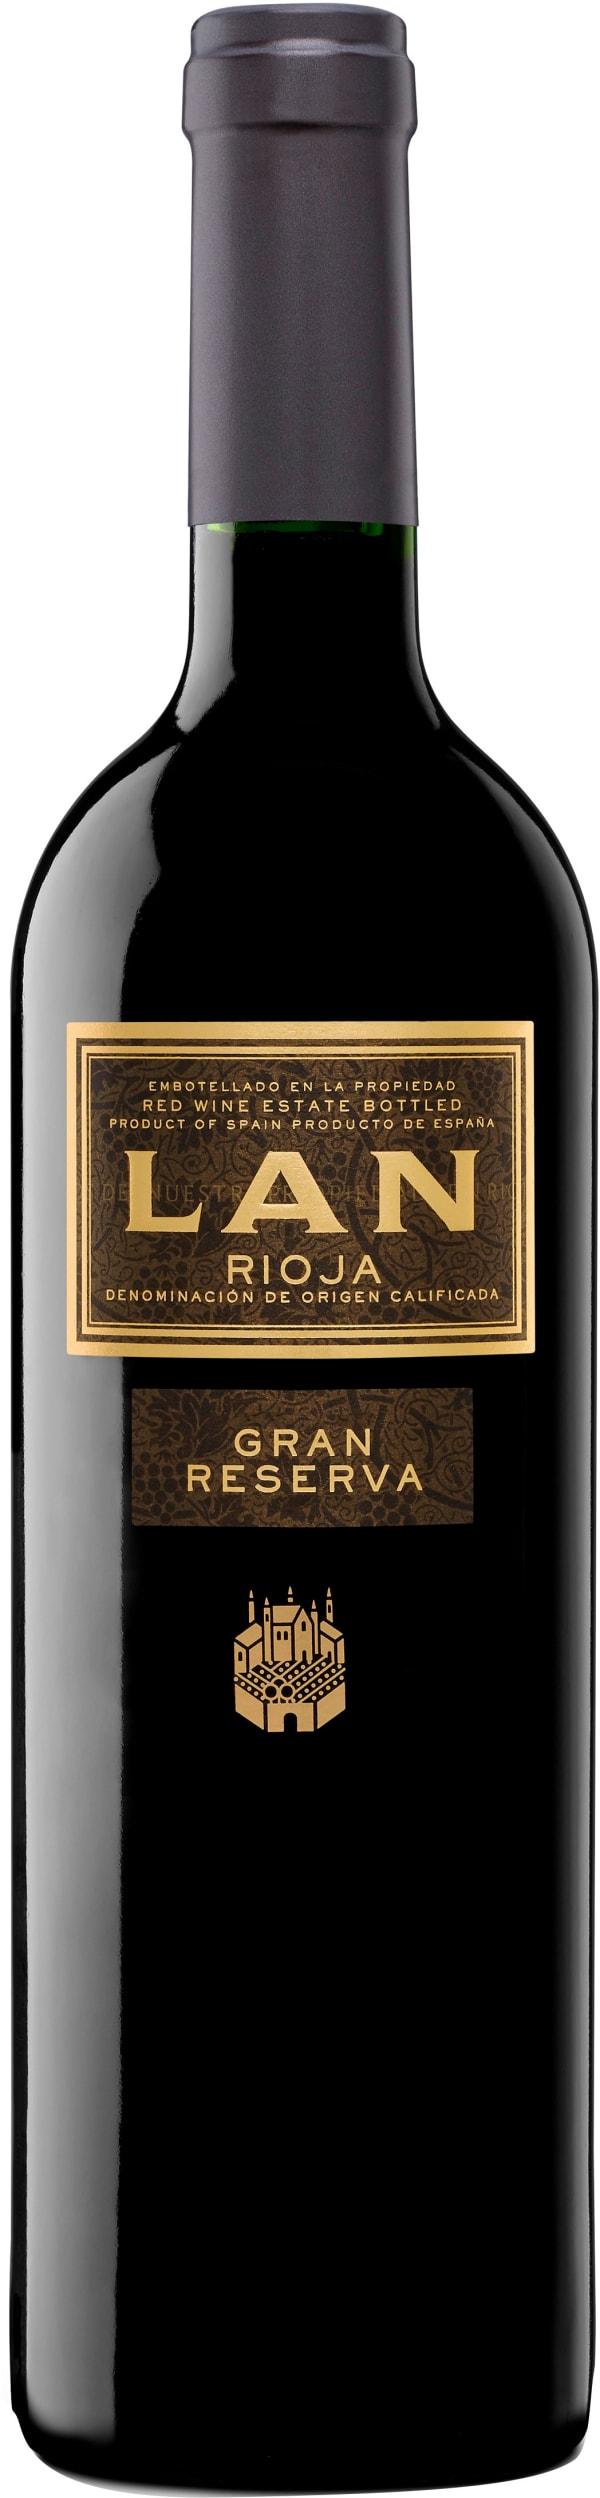 Lan Gran Reserva 2008